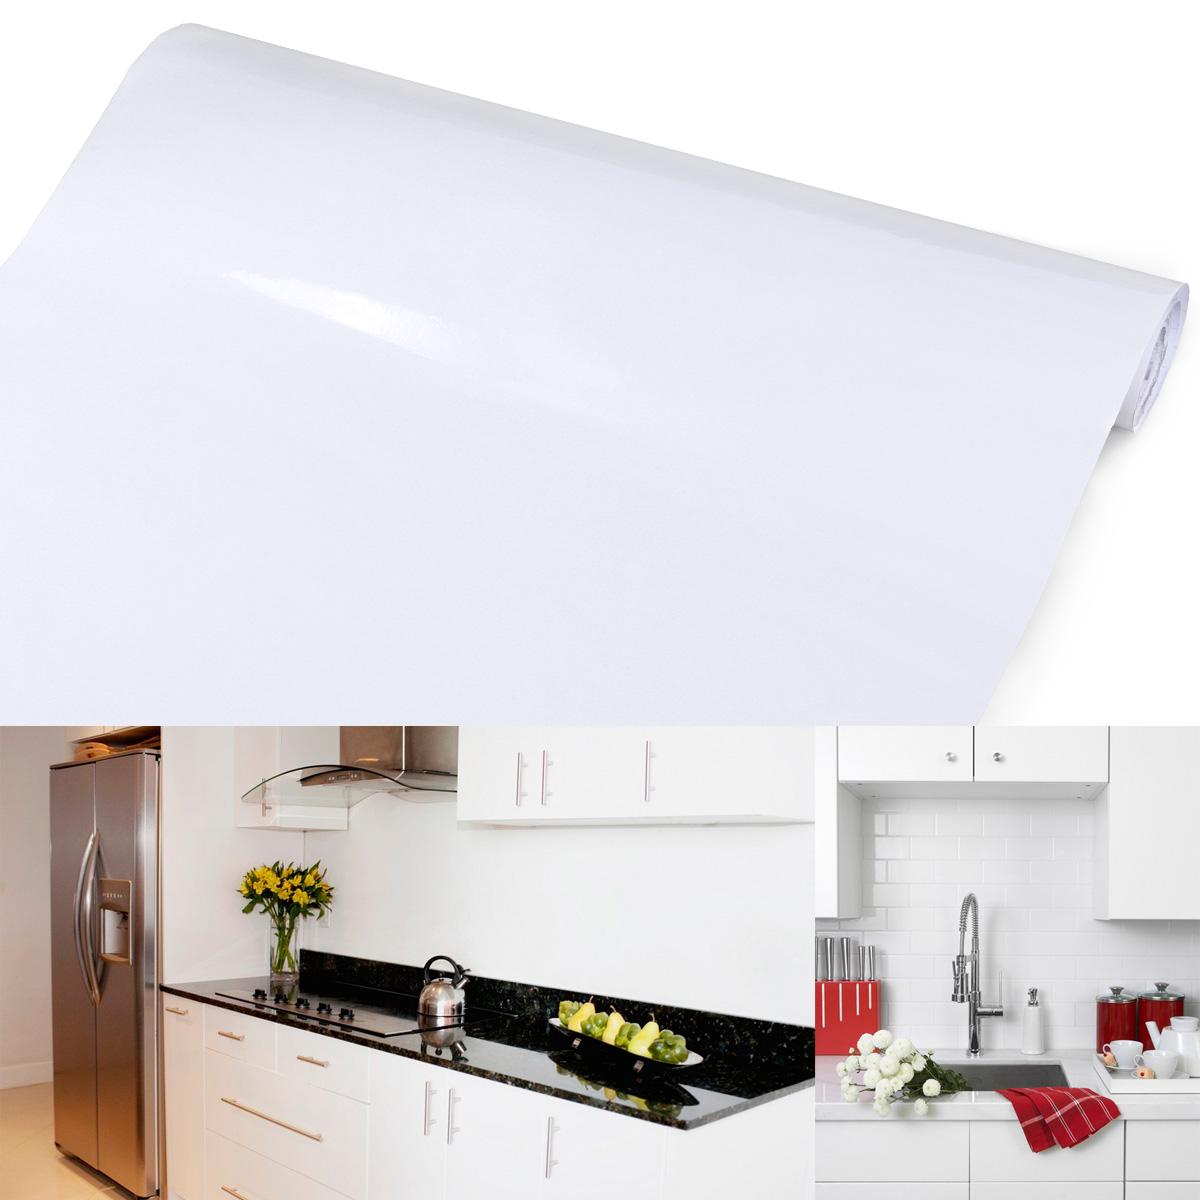 10mx 61cm wide Bathroom Kitchen Vinyl Tile Stickers covers ...